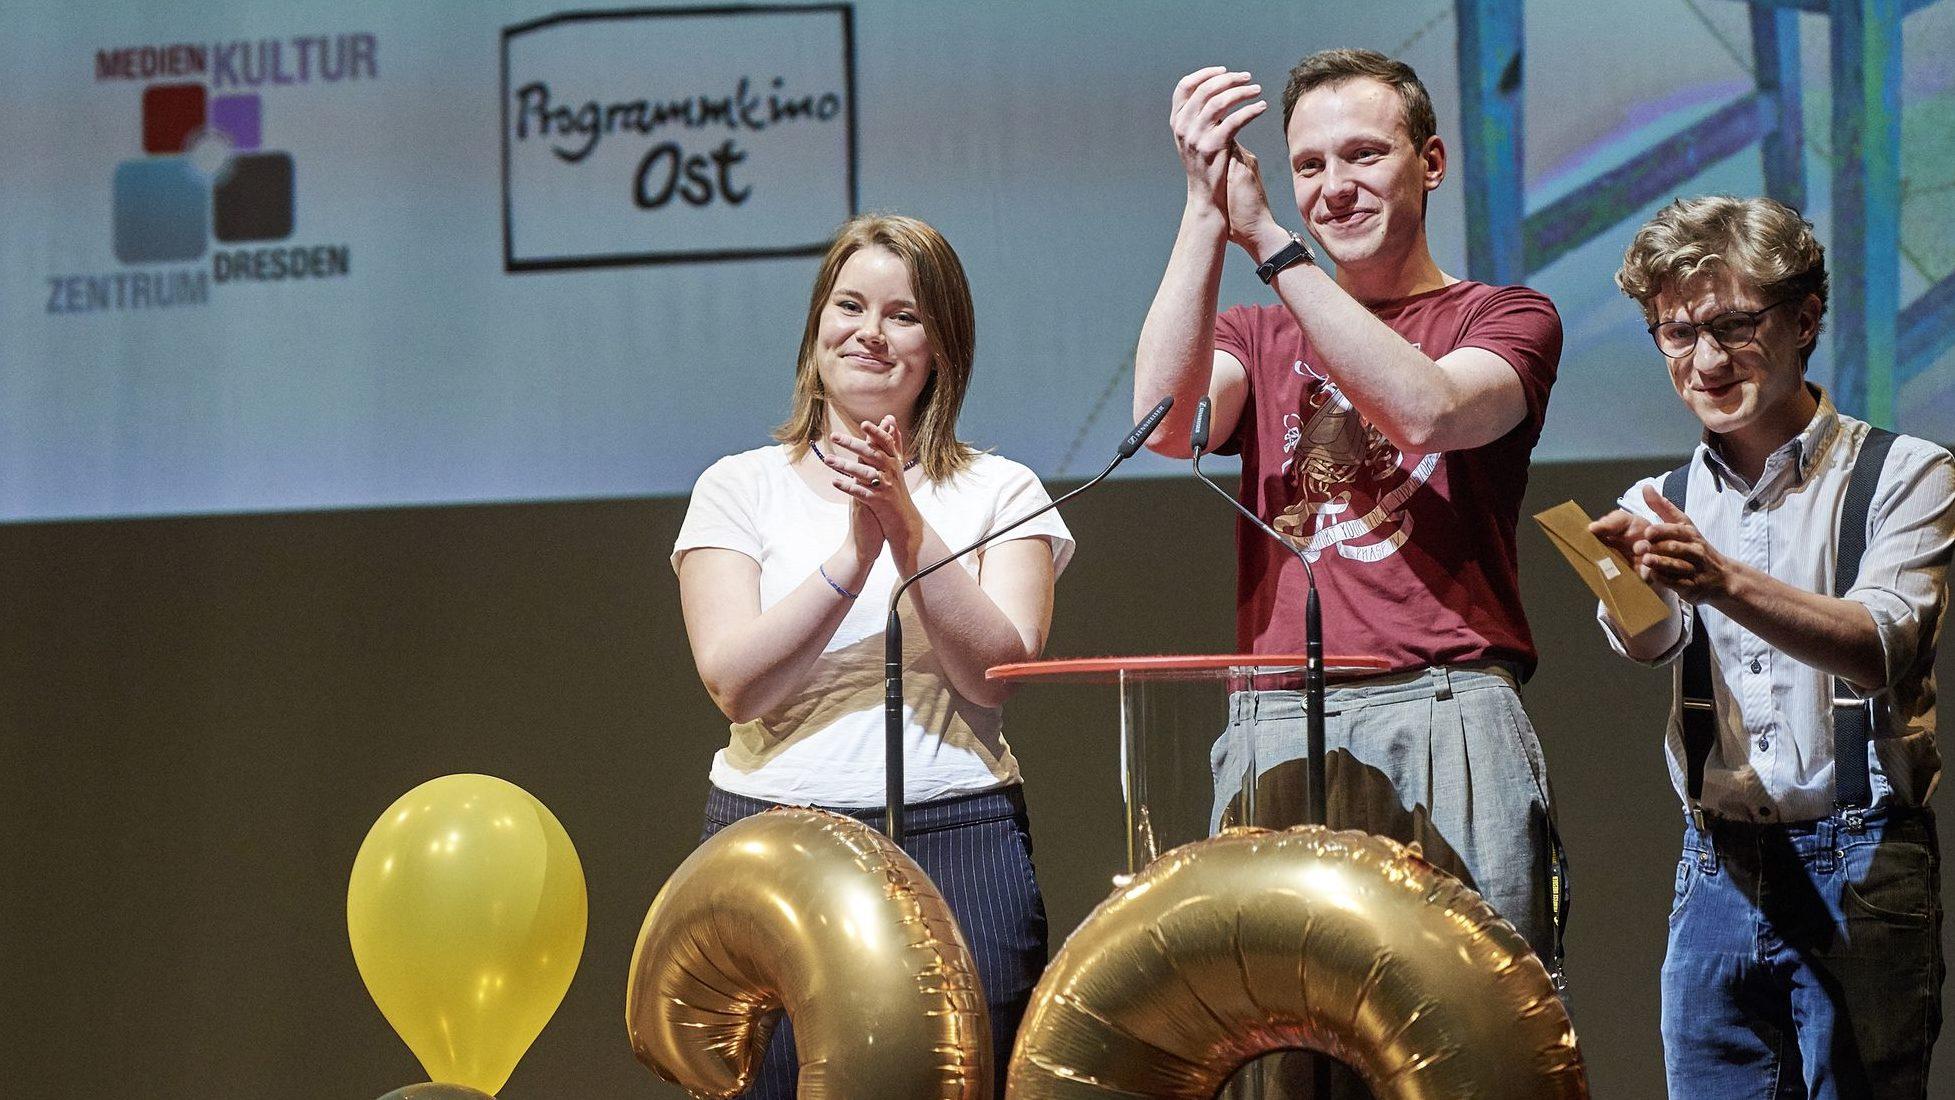 Stephan Floss von der Jugendjury des 20. Filmfests Dresden. Foto: PR